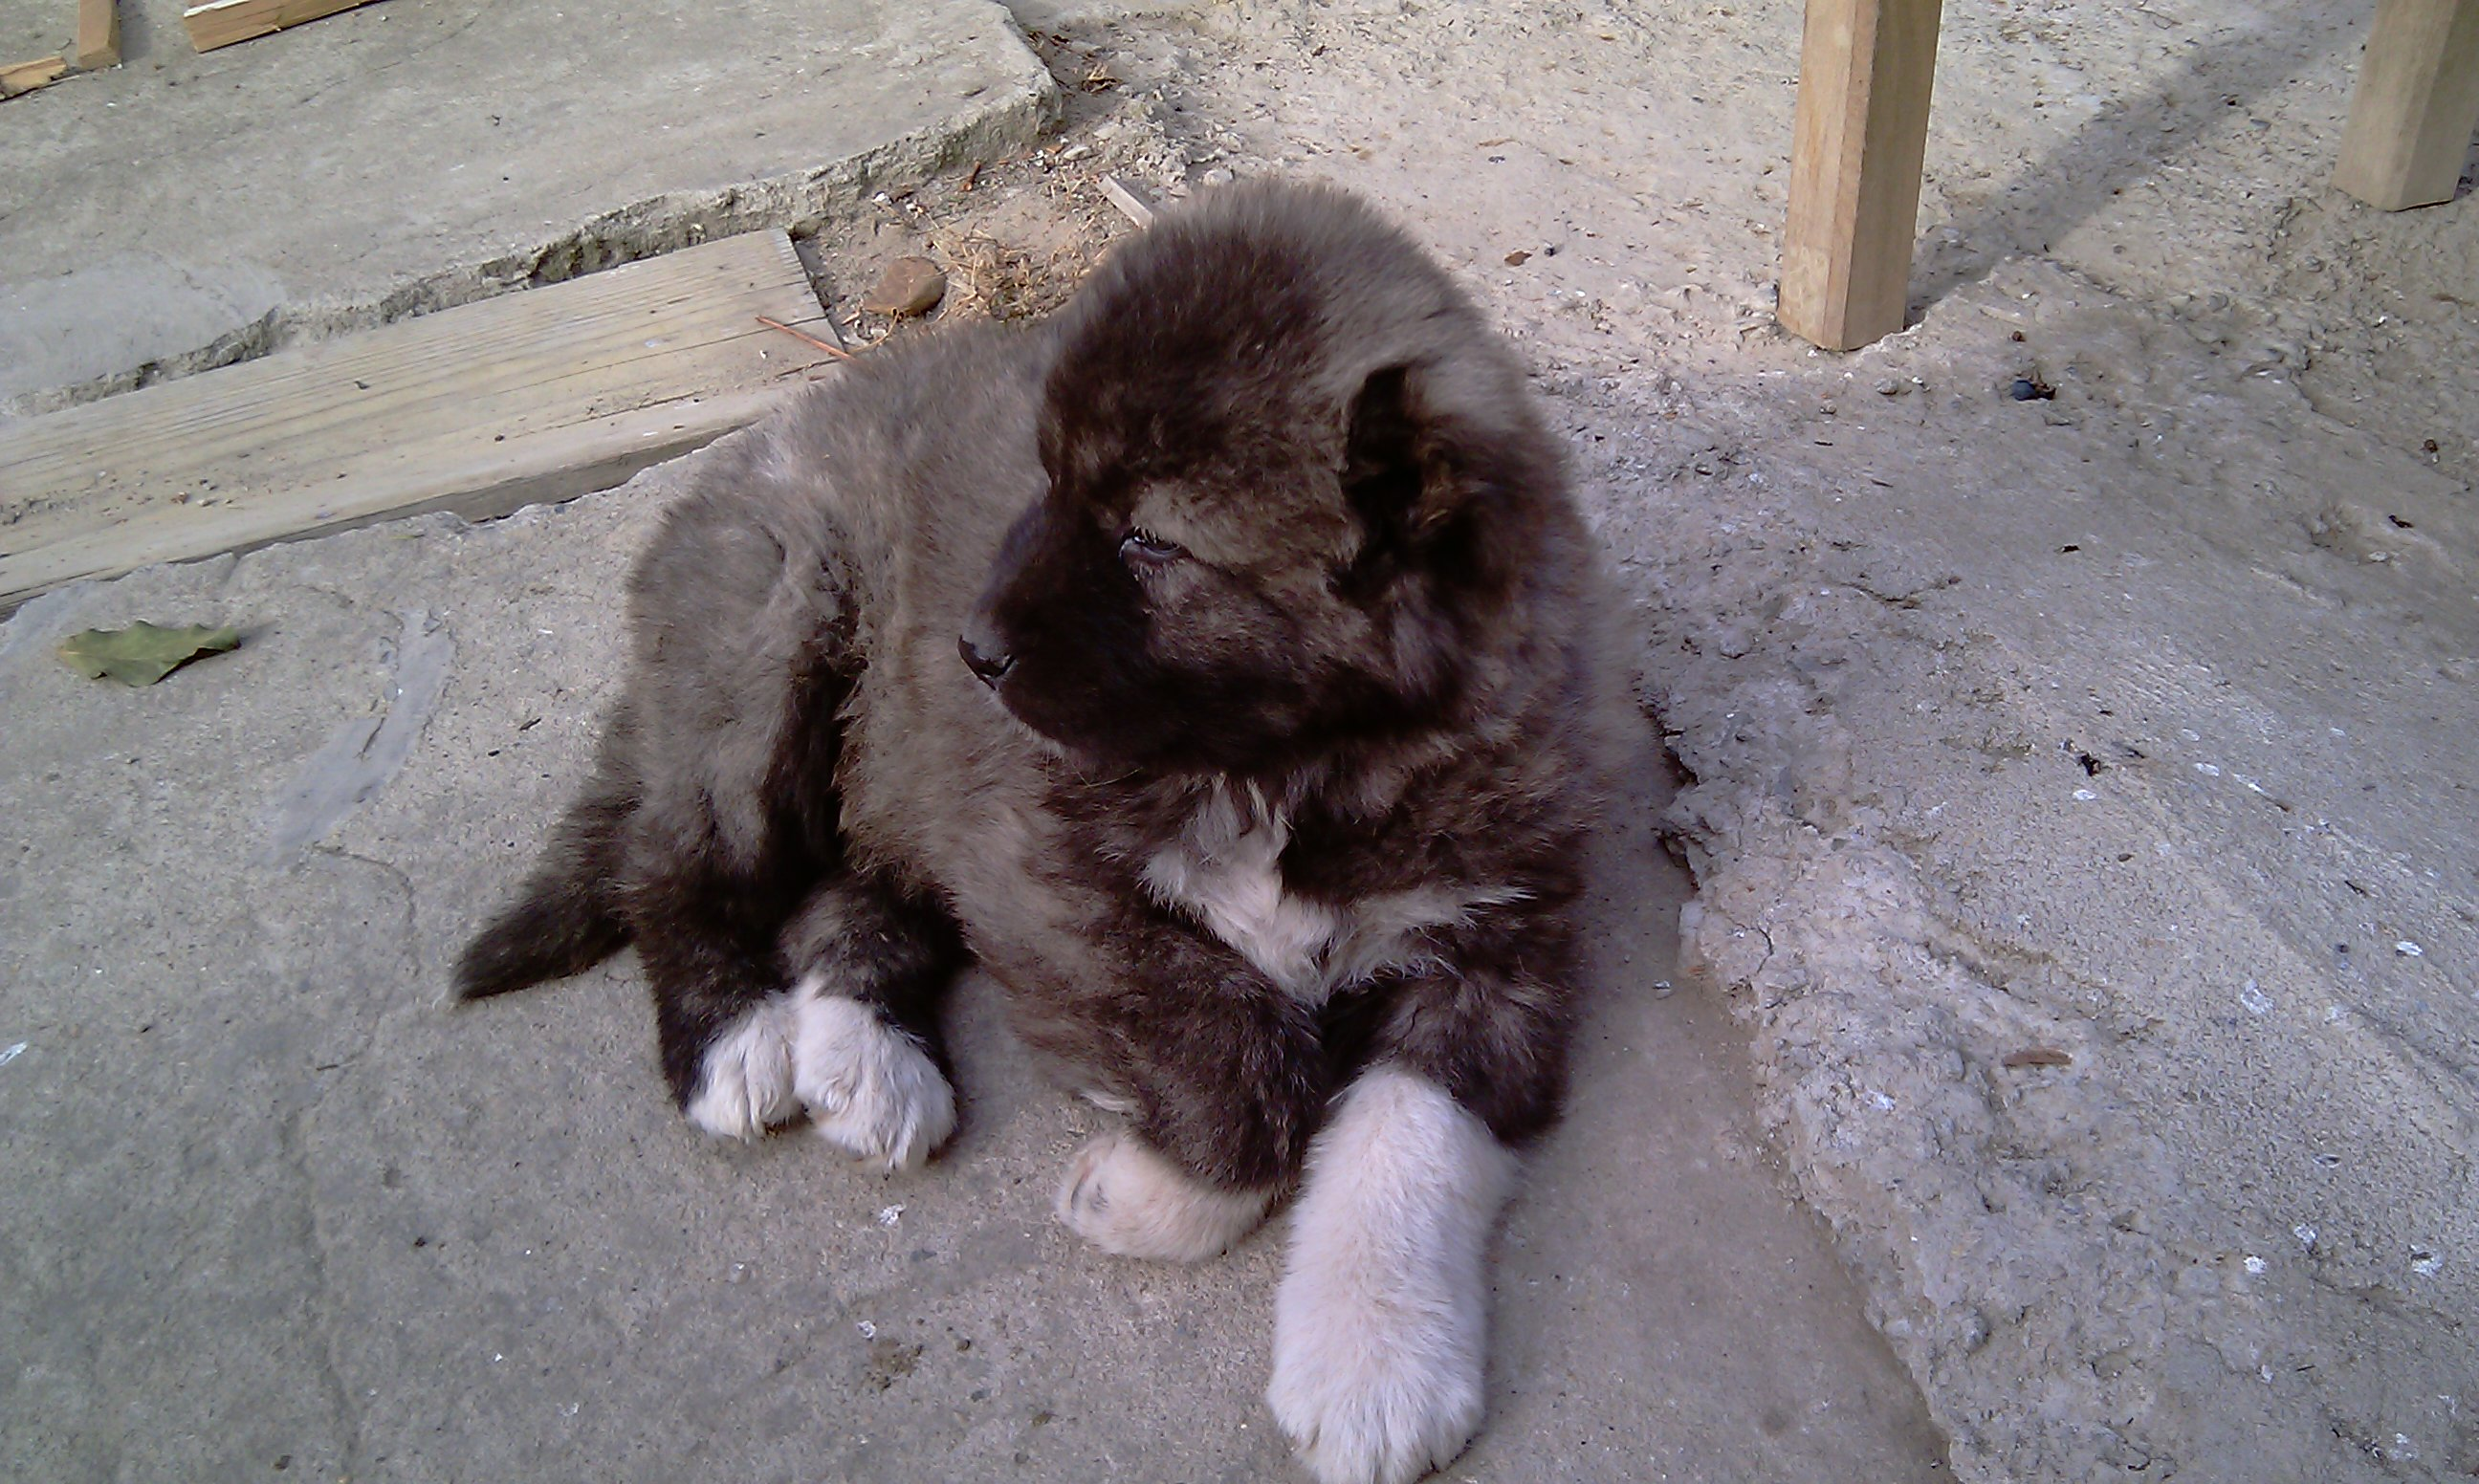 Georgian Shepherd puppy wallpaper